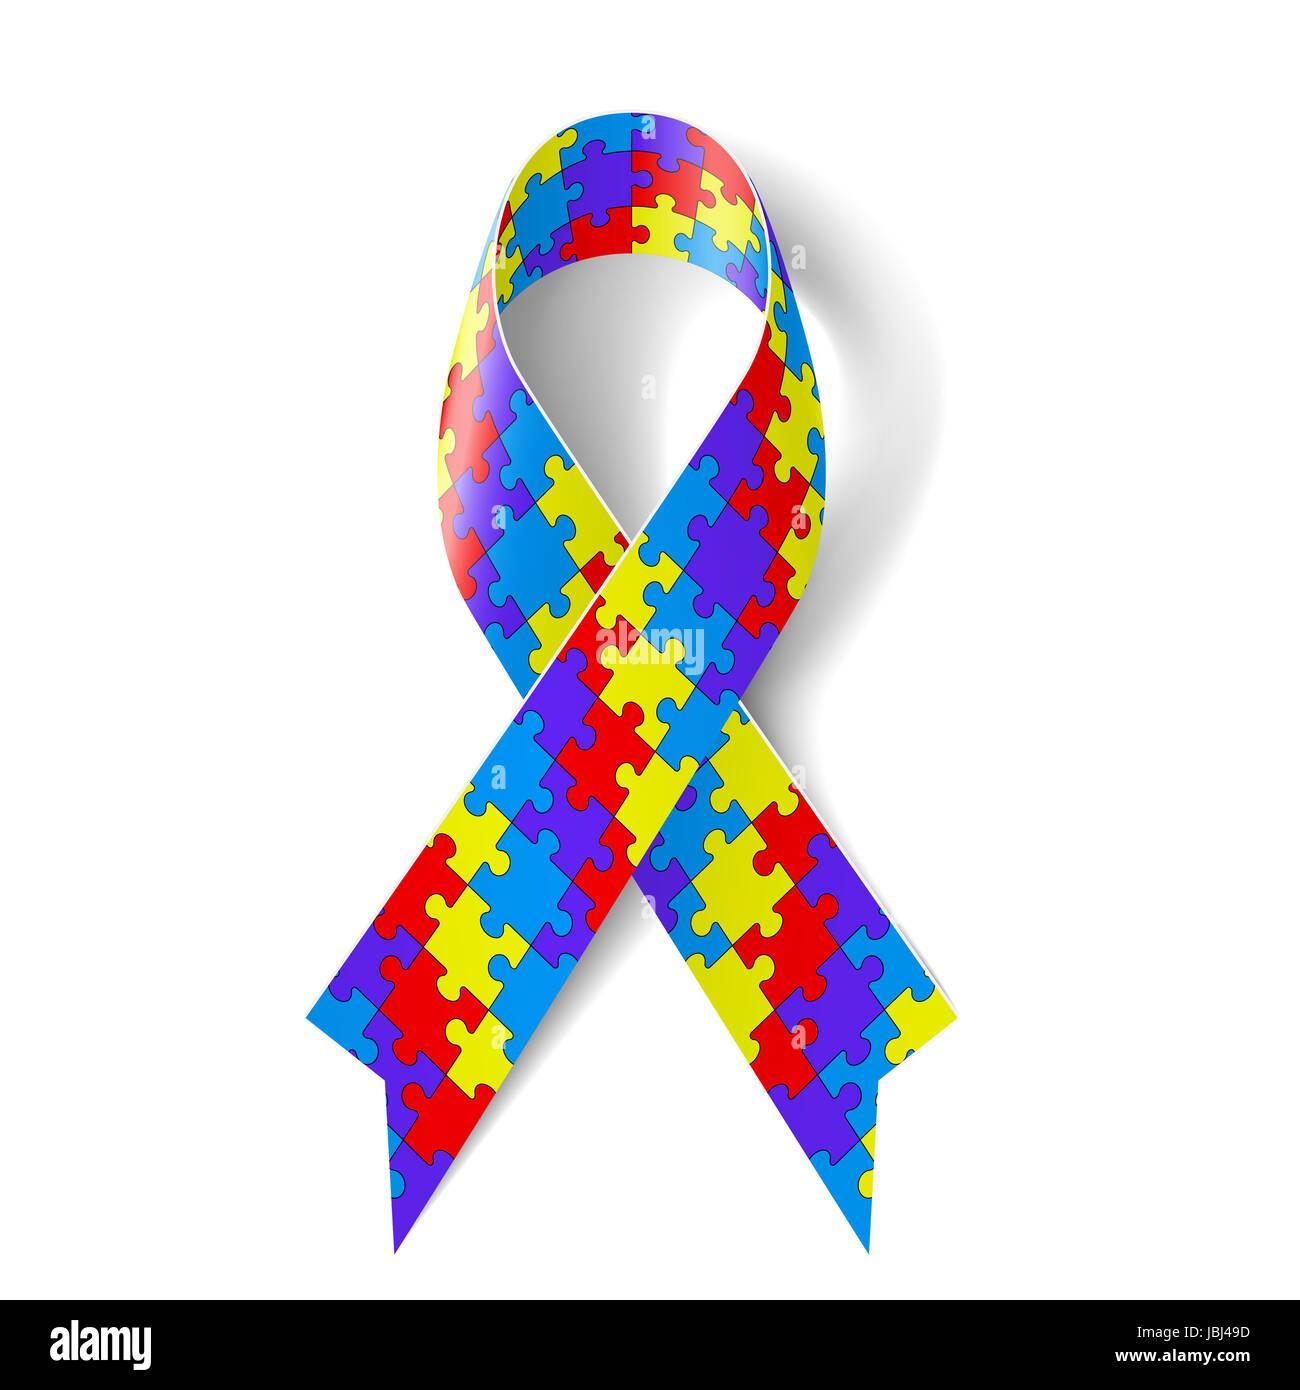 Colorful puzzle ribbon as symbol autism awareness stock photo colorful puzzle ribbon as symbol autism awareness biocorpaavc